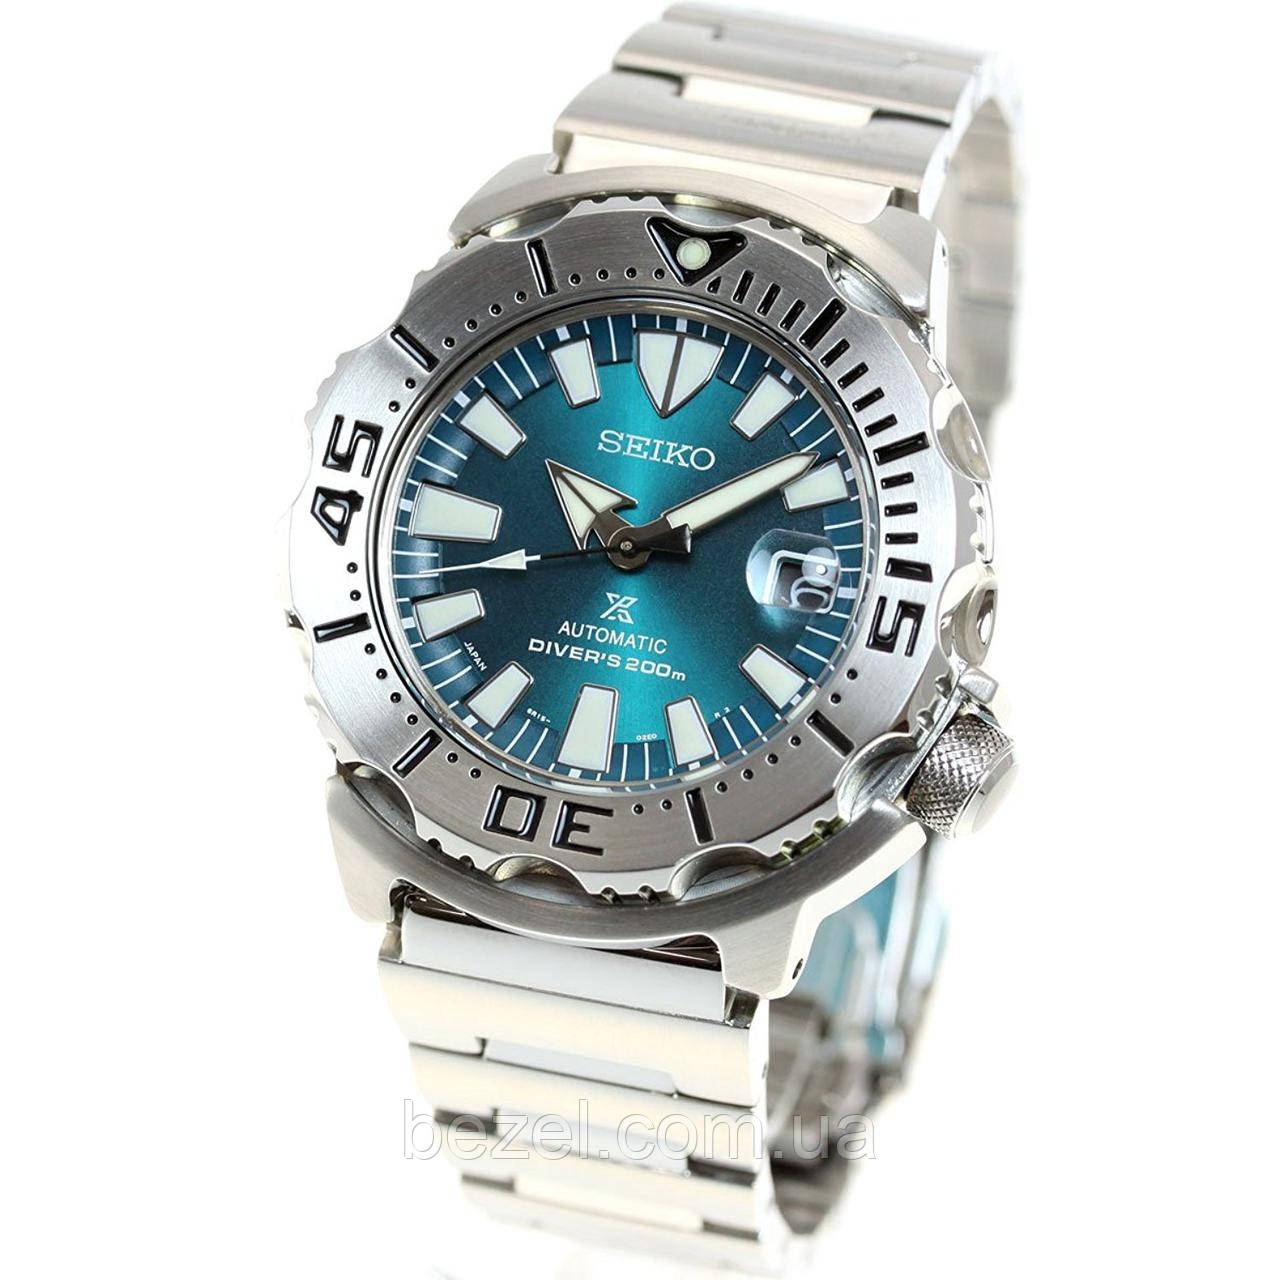 Мужские часы Seiko MONSTER Green Automatic 6R15 Limited SZSC005 JAPAN